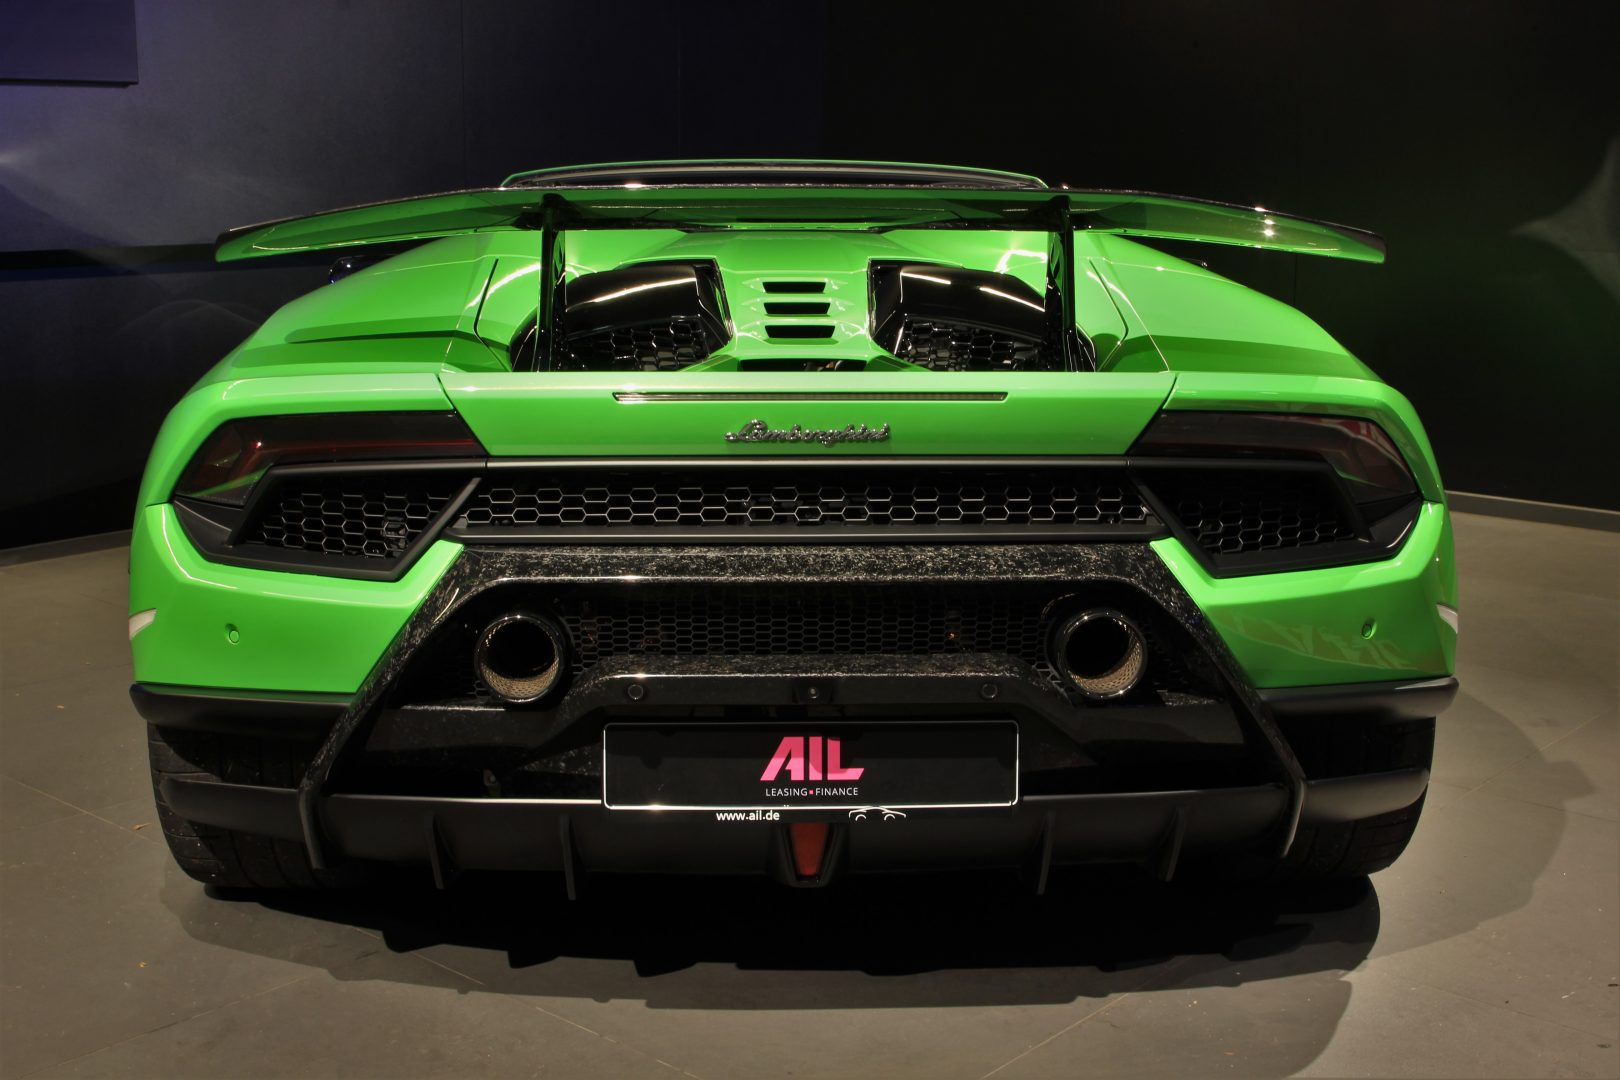 AIL Lamborghini Huracan Performante Spyder LP 640-4 5